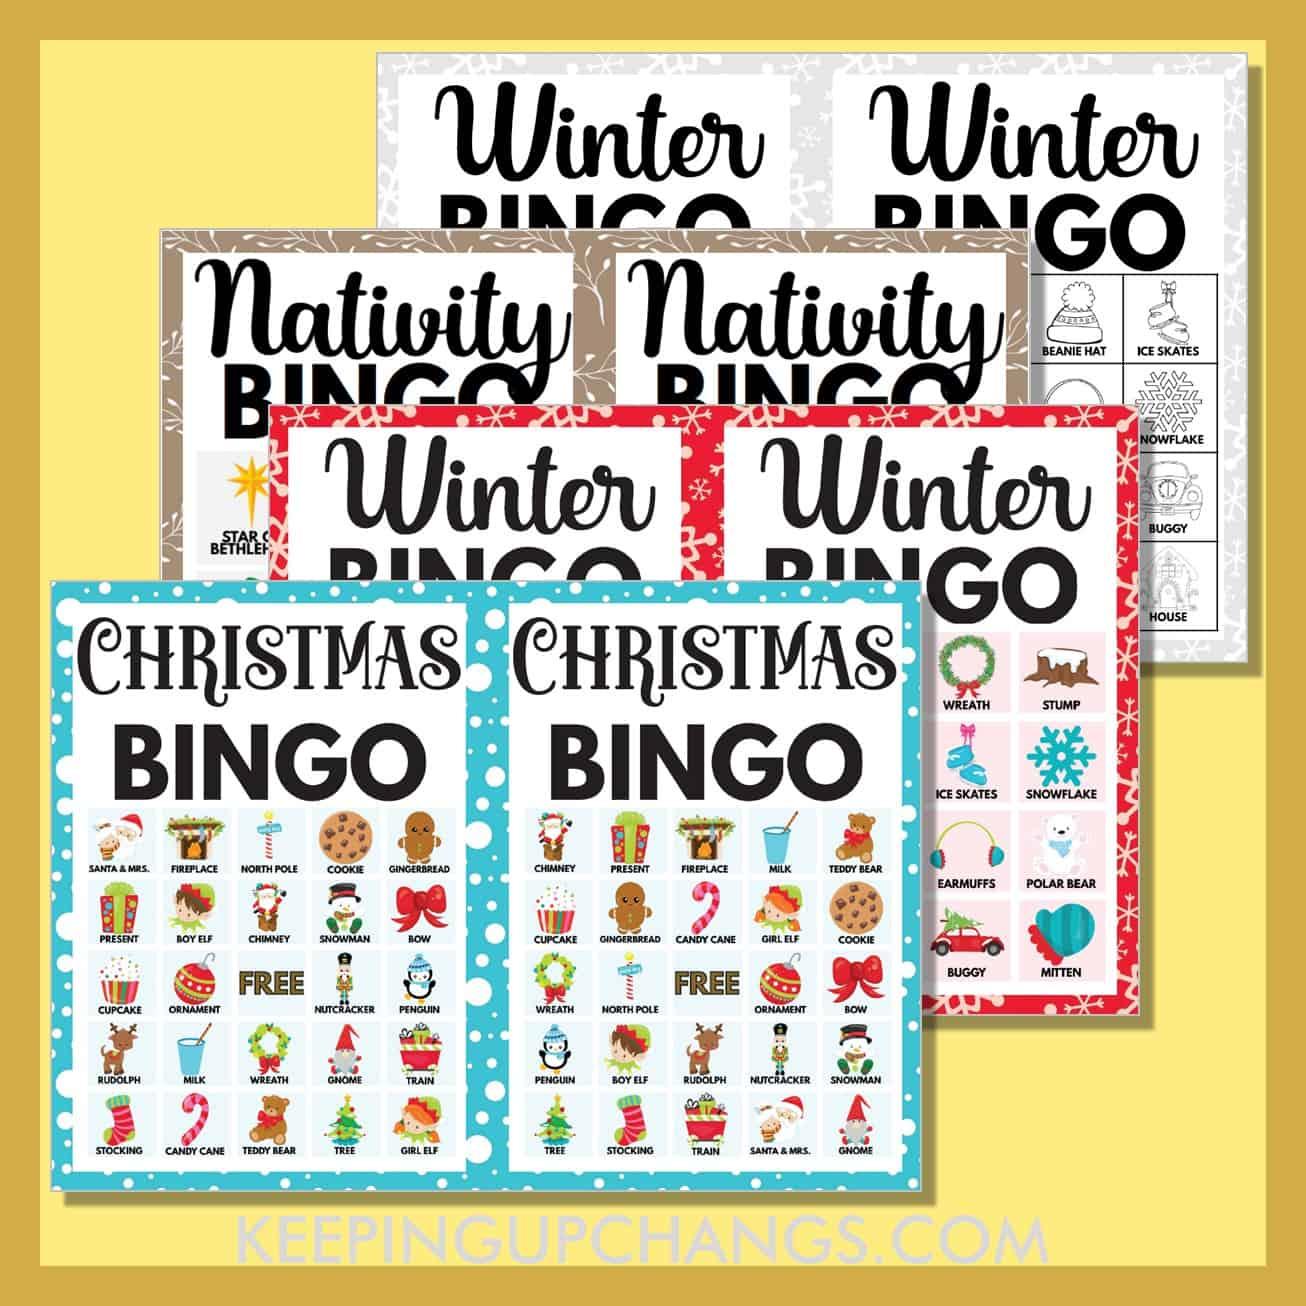 most popular free christmas bingo games including 5x5, 4x4, 3x3 grids.